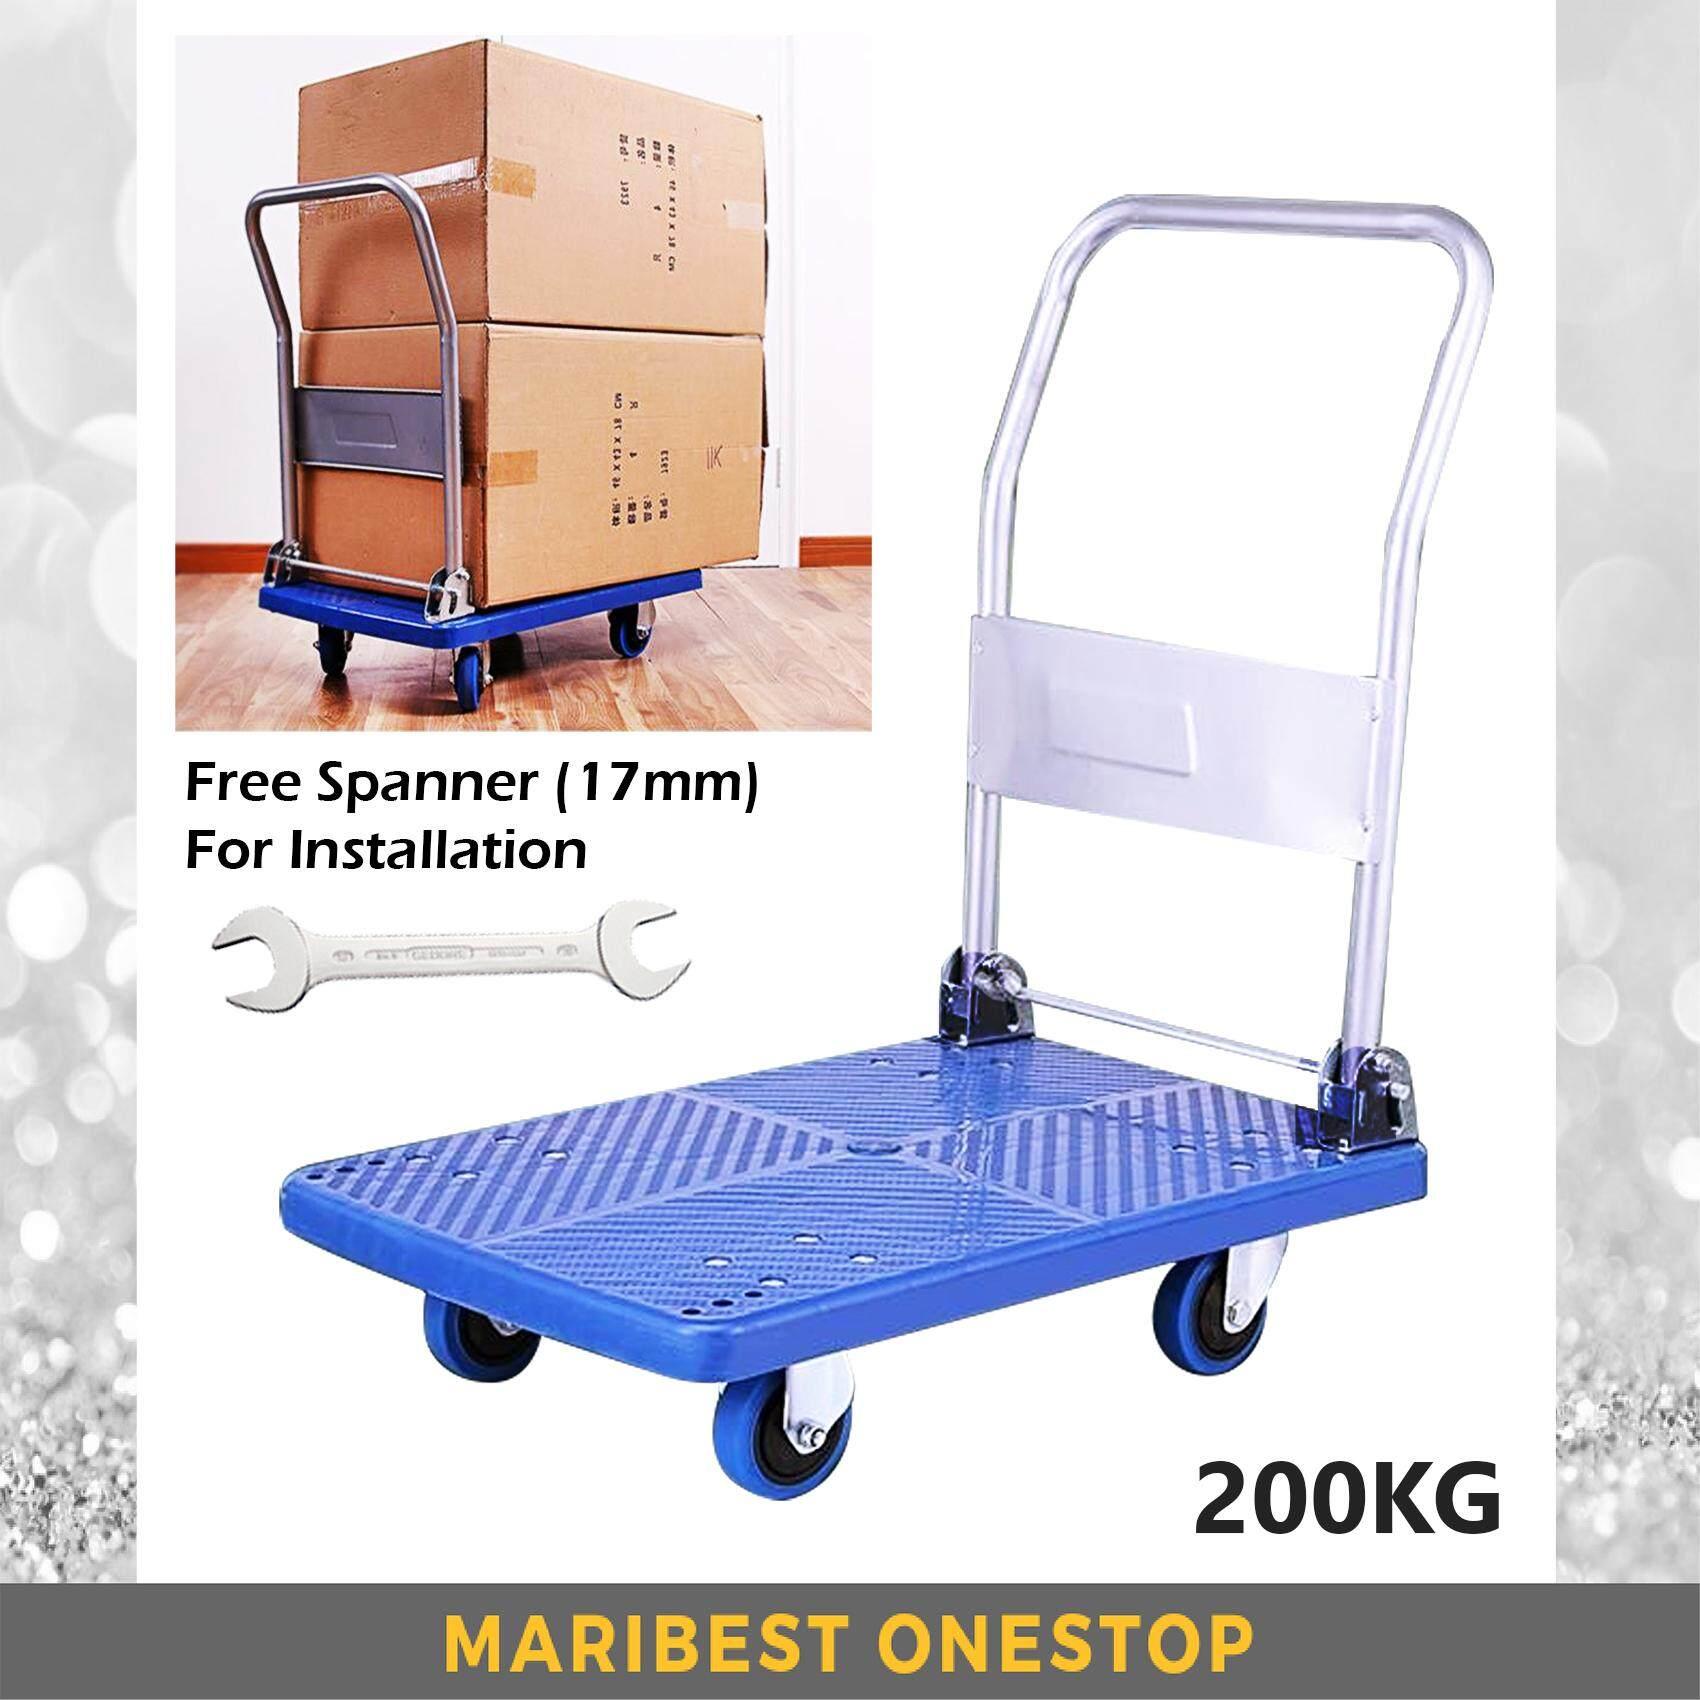 Heavy Duty PVC Foldable Trolley Platform Cart Hand Truck Trolley Capacity 200KG